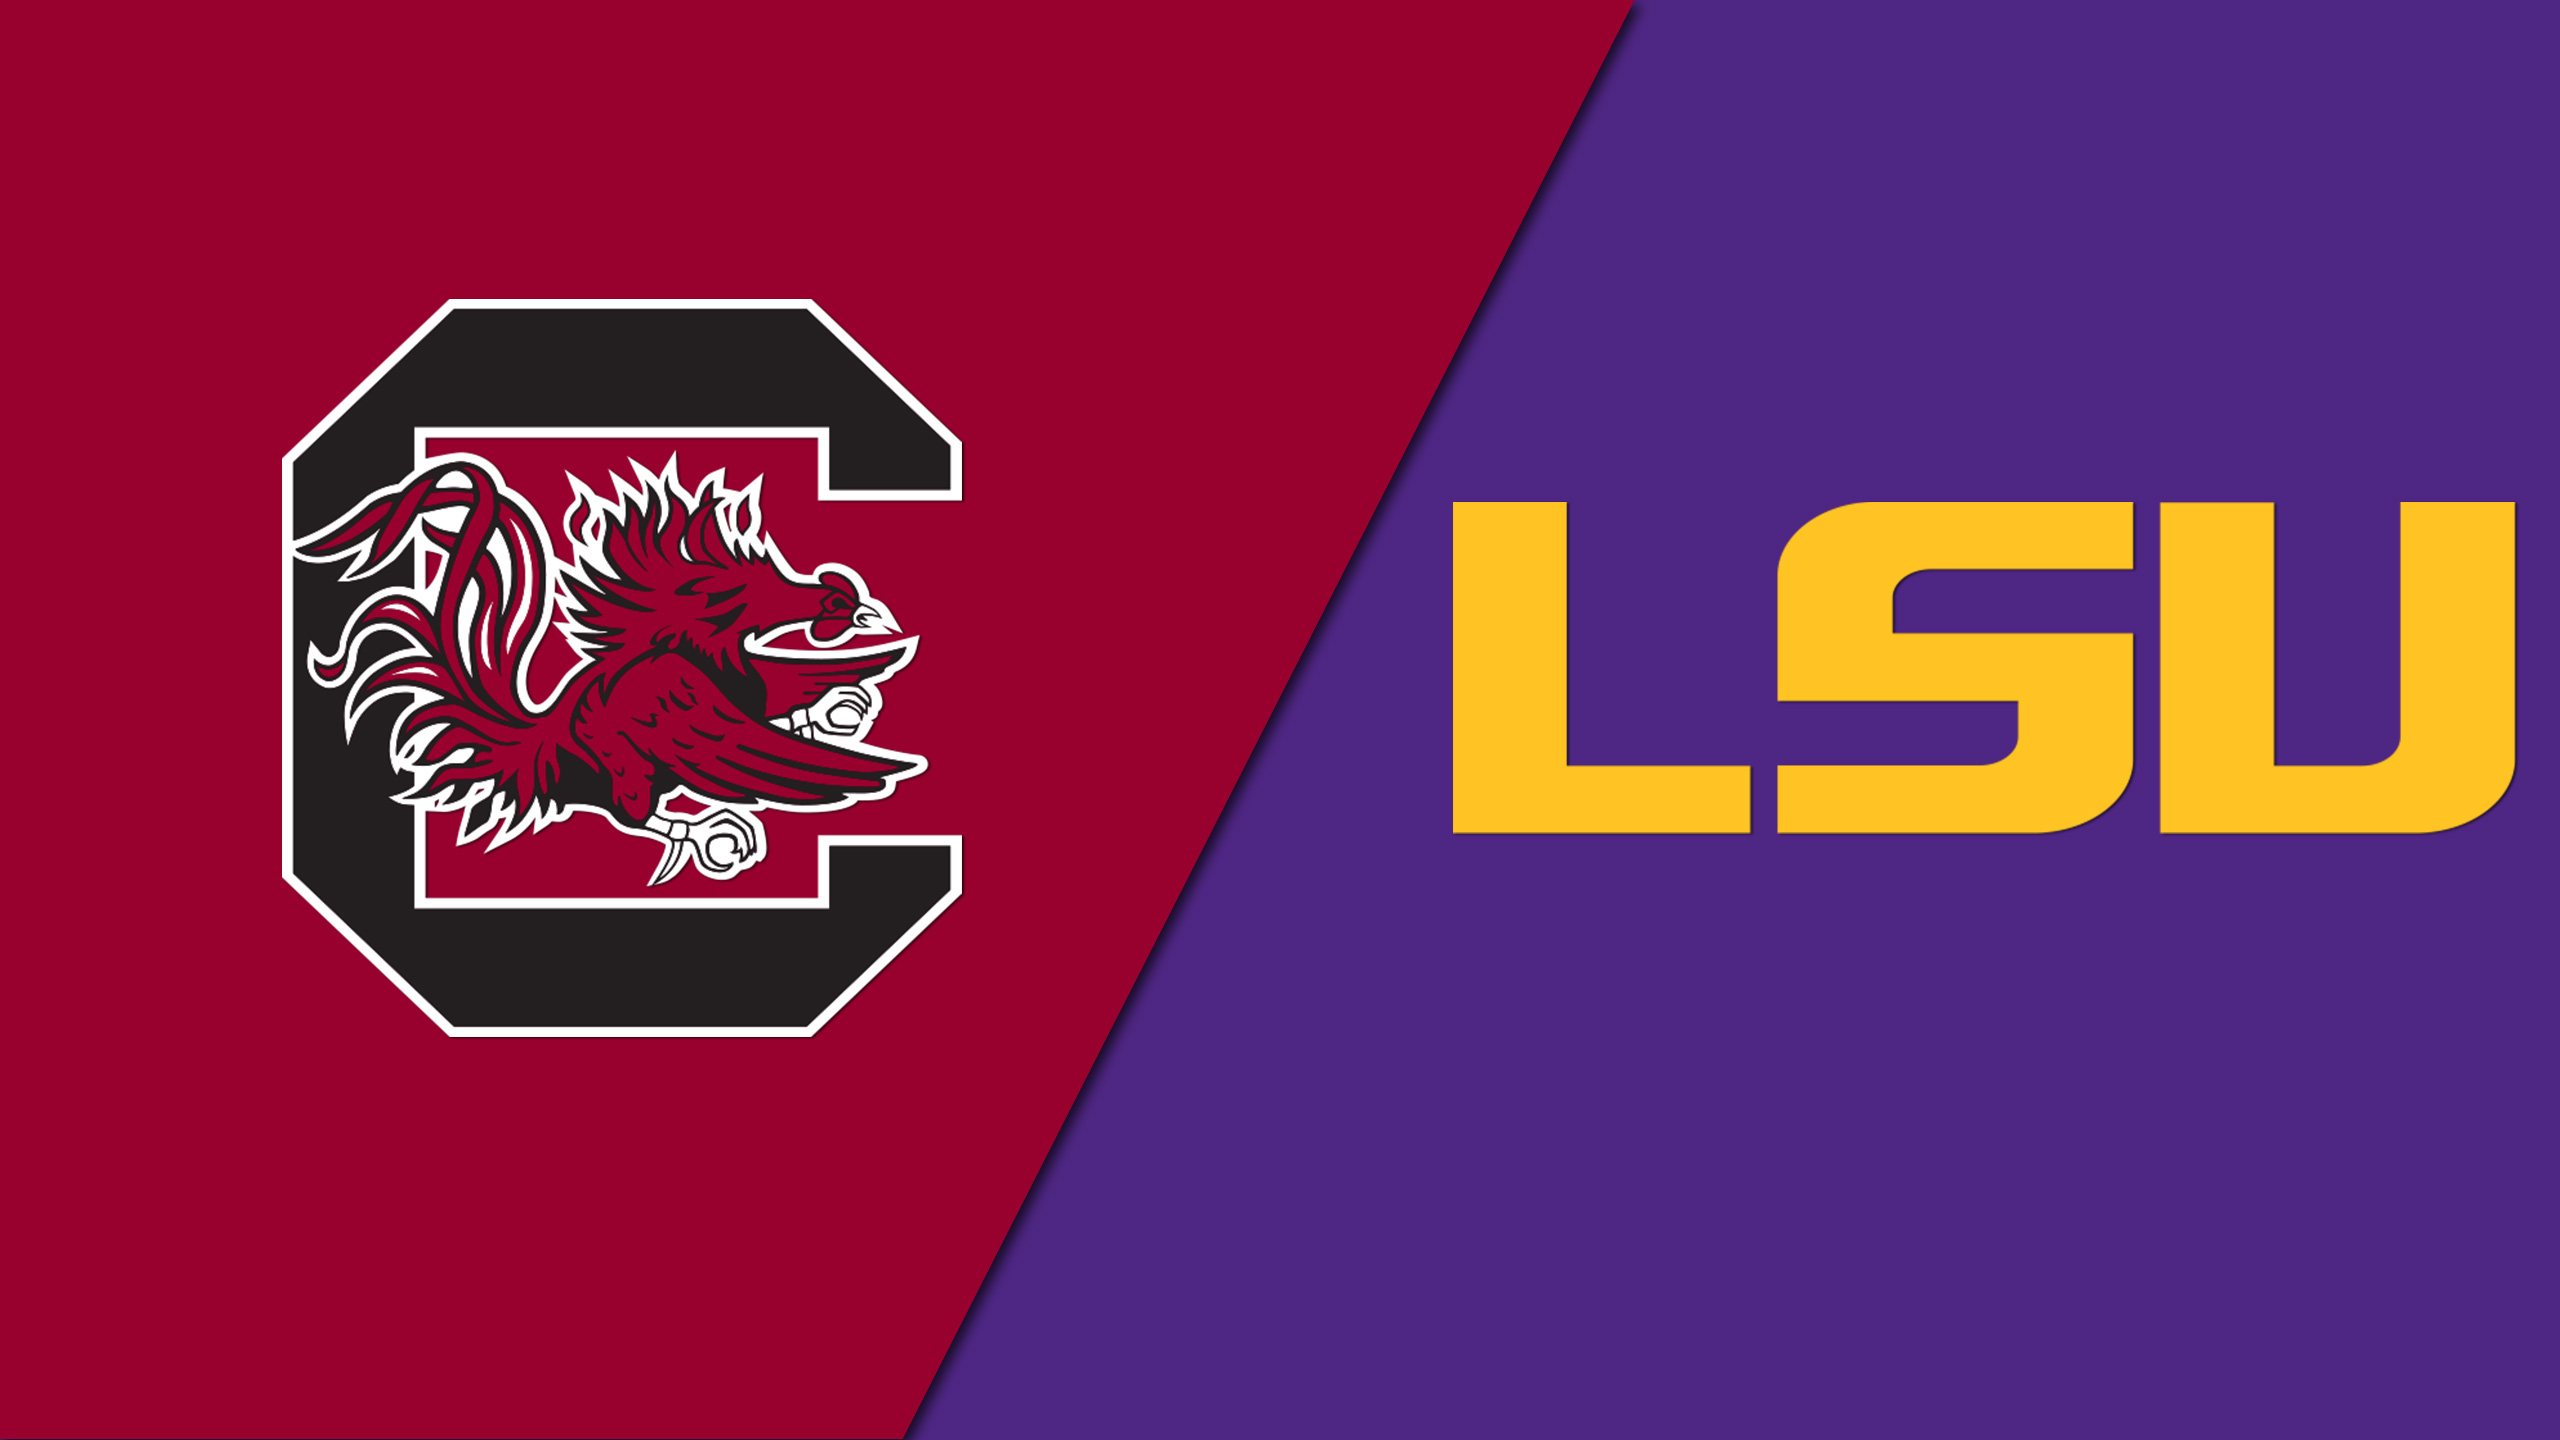 South Carolina vs. LSU